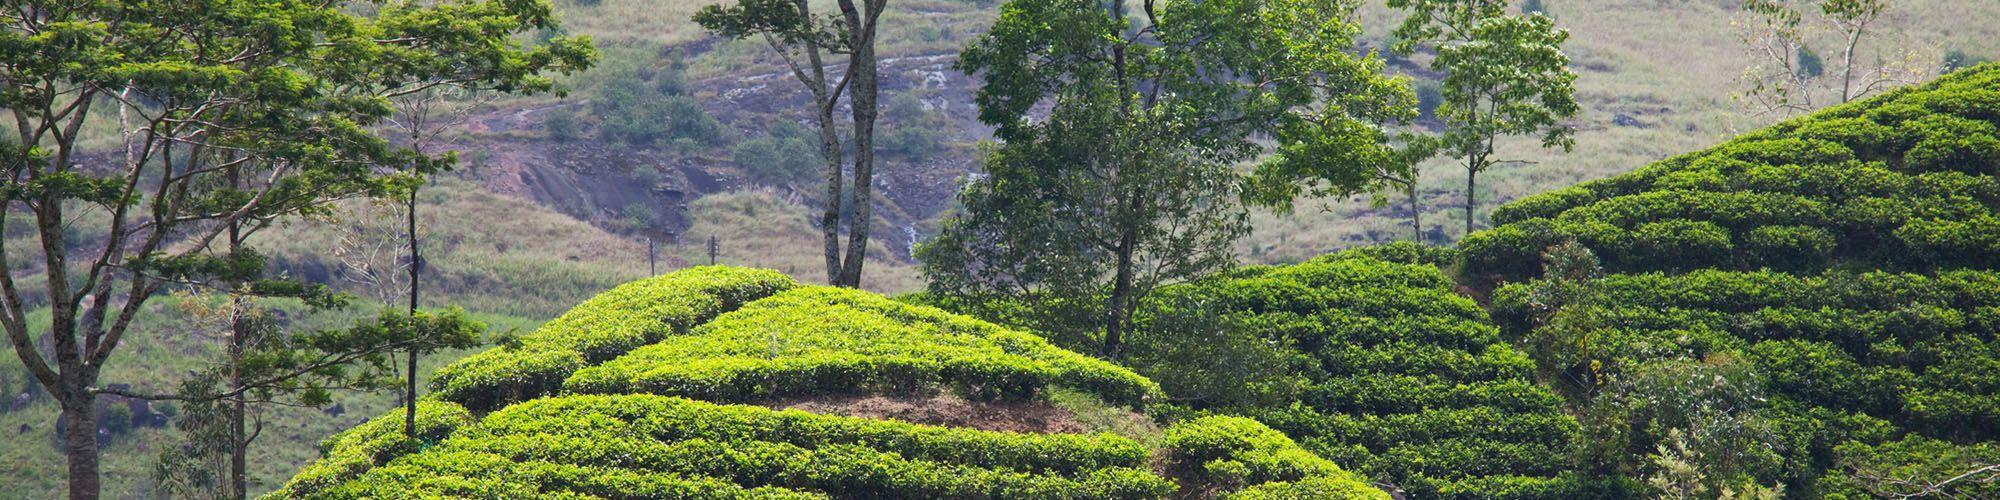 Sri Lanka, Tea estates, Cycling